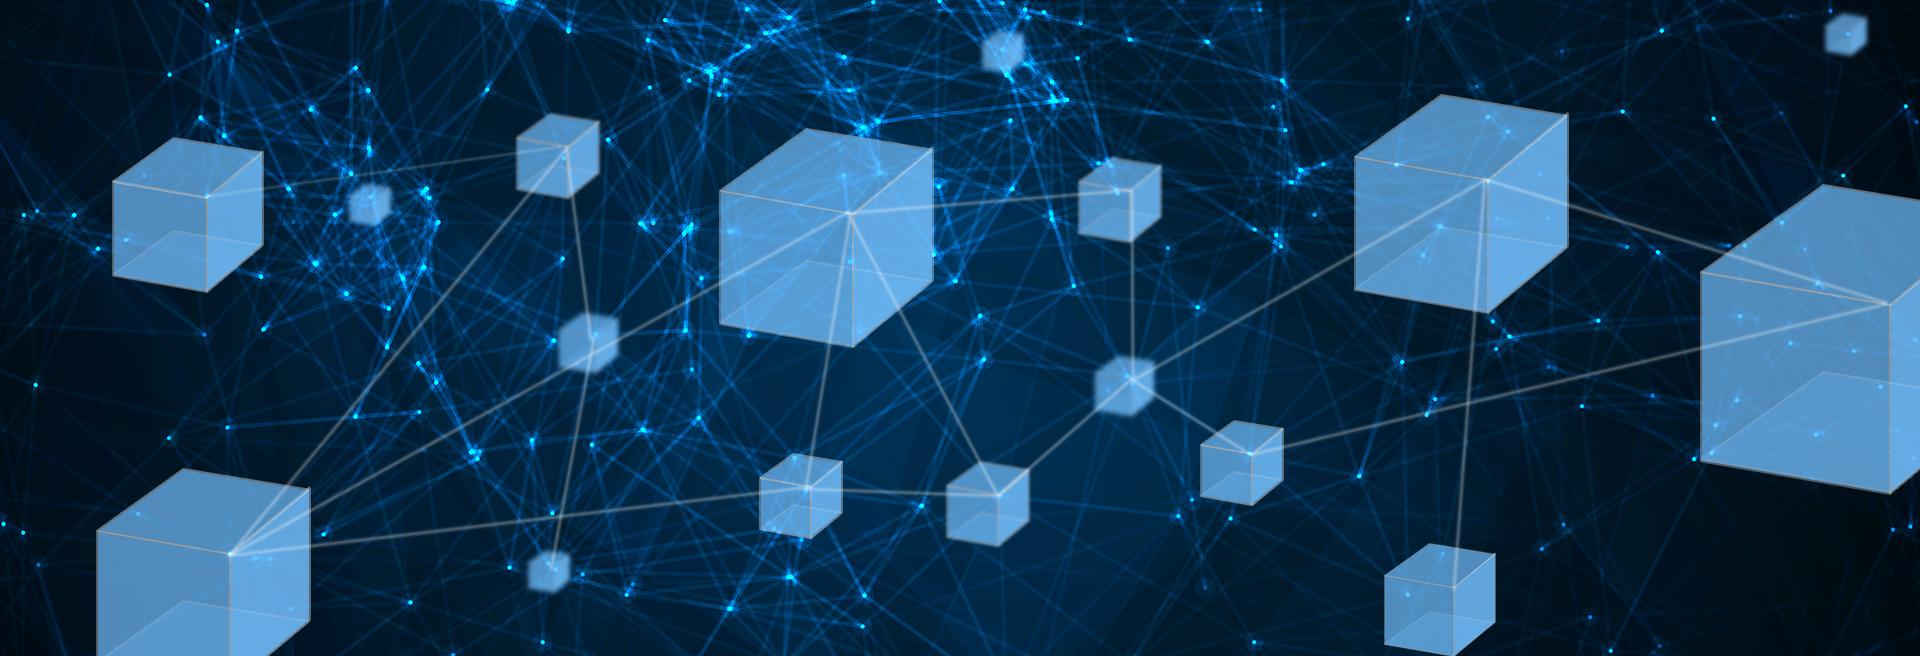 Rethinking Blockchain Beyond the Finance Industry